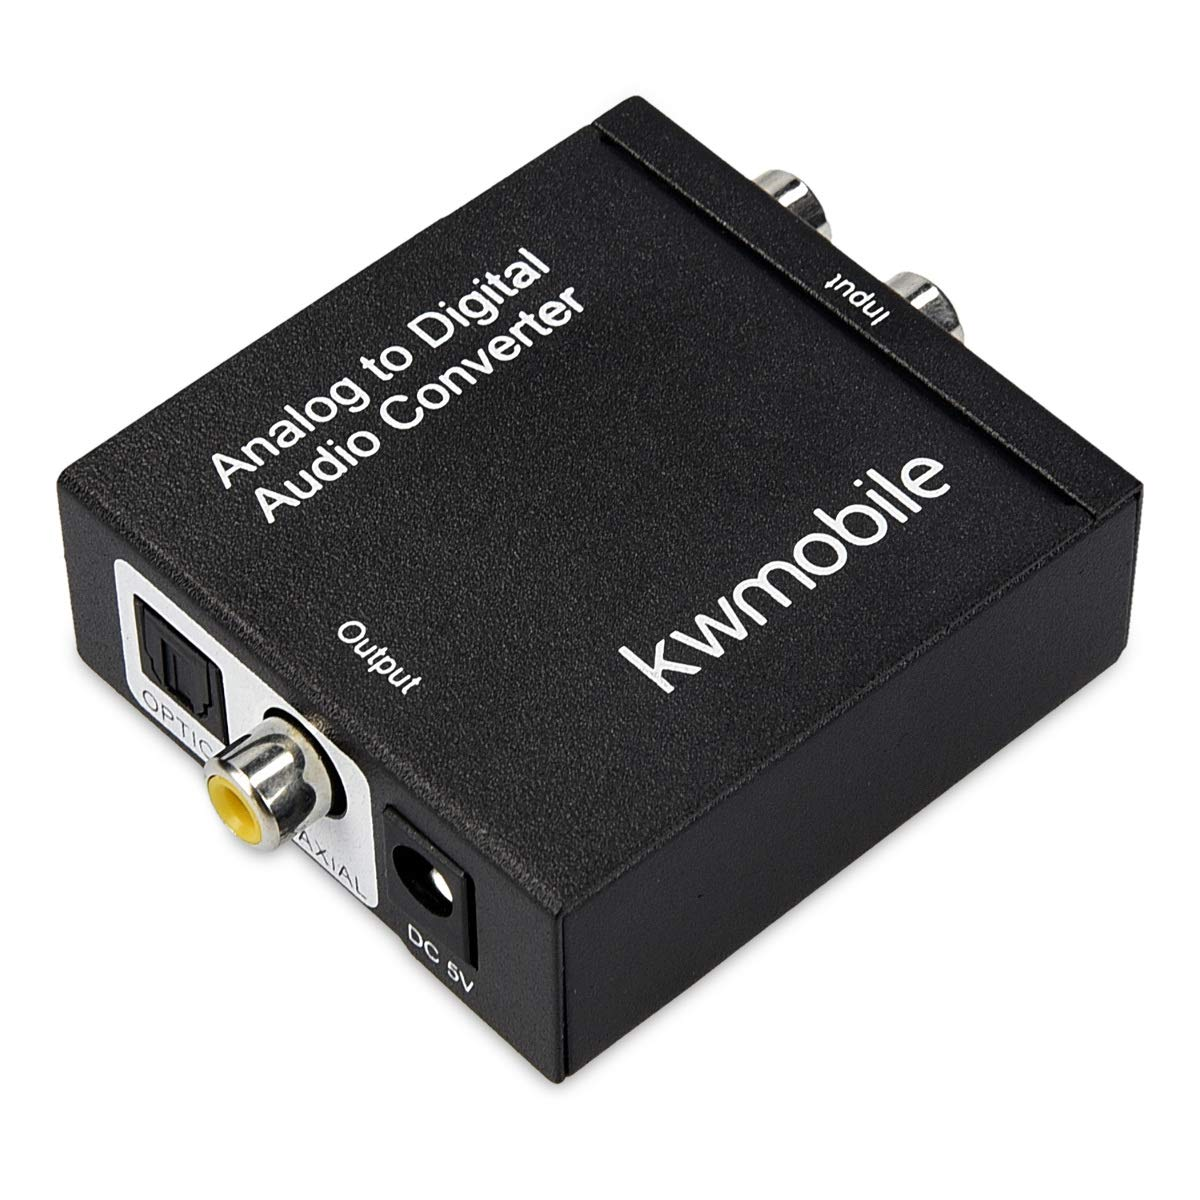 Audiowandler Analog auf Digital Wandler kwmobile Analog zu Digital Audio Konverter Klinke RCA Stecker zu 2X Ausgang Toslink//SPDIF Koaxial Cinch